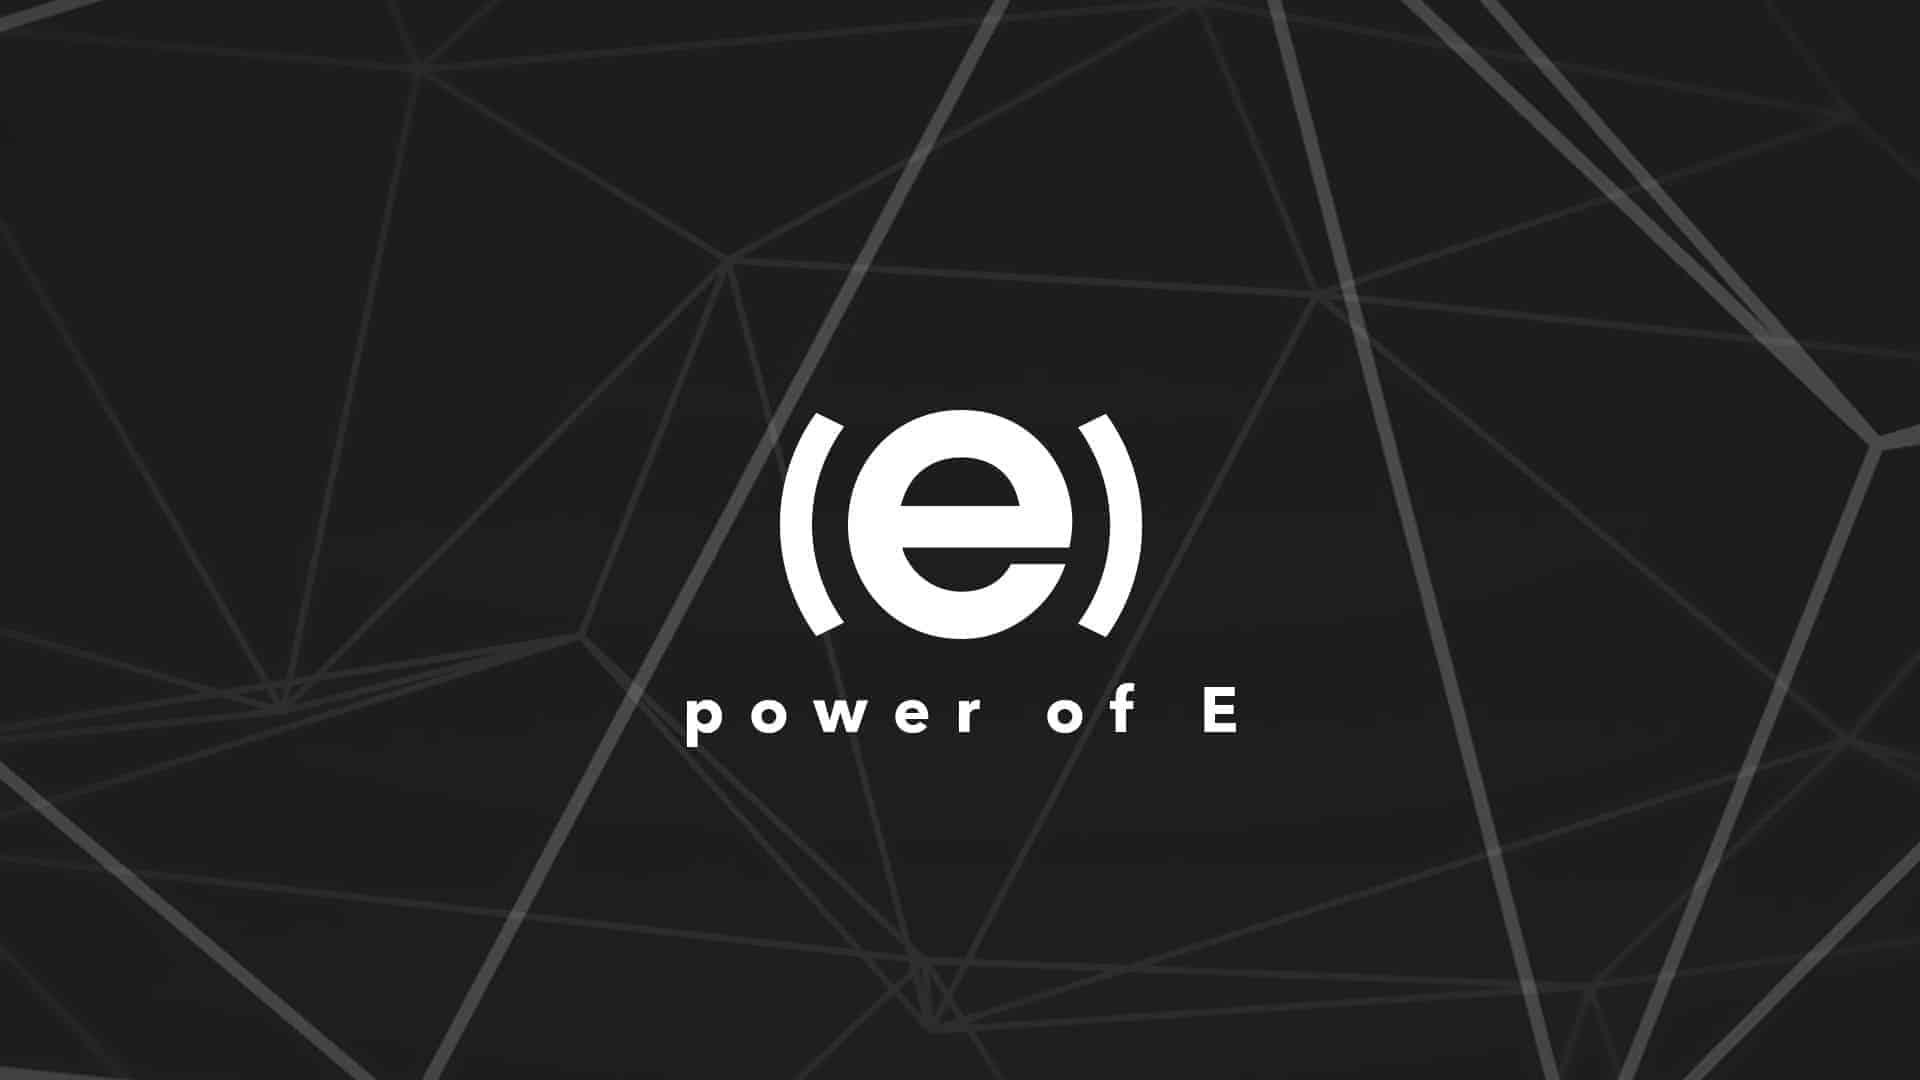 The Power of E